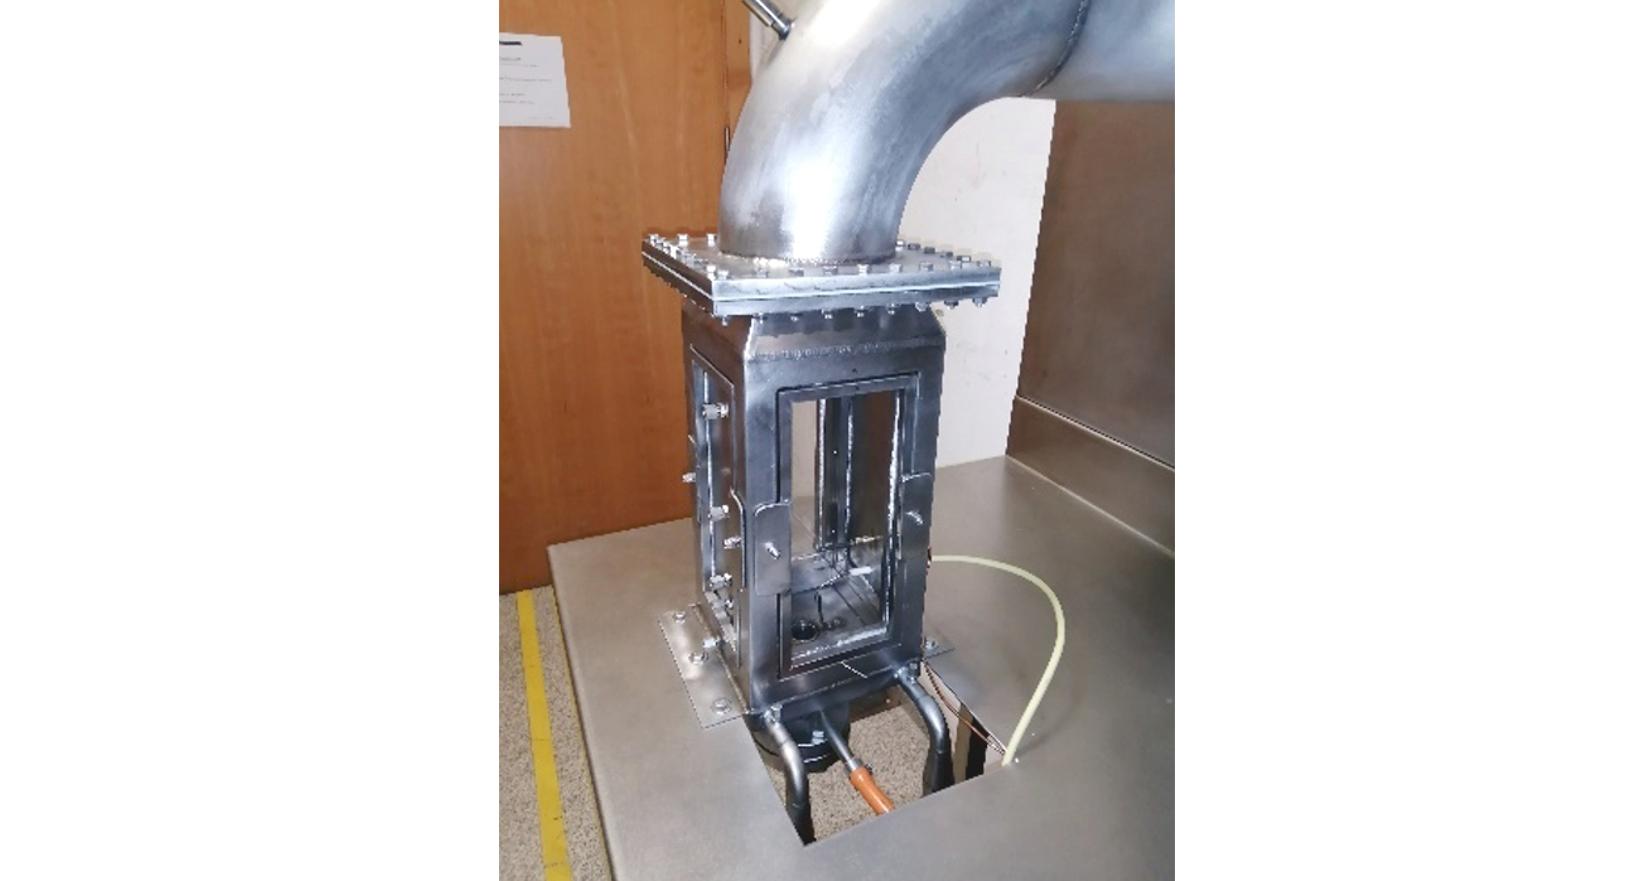 Oxy-fuel burner